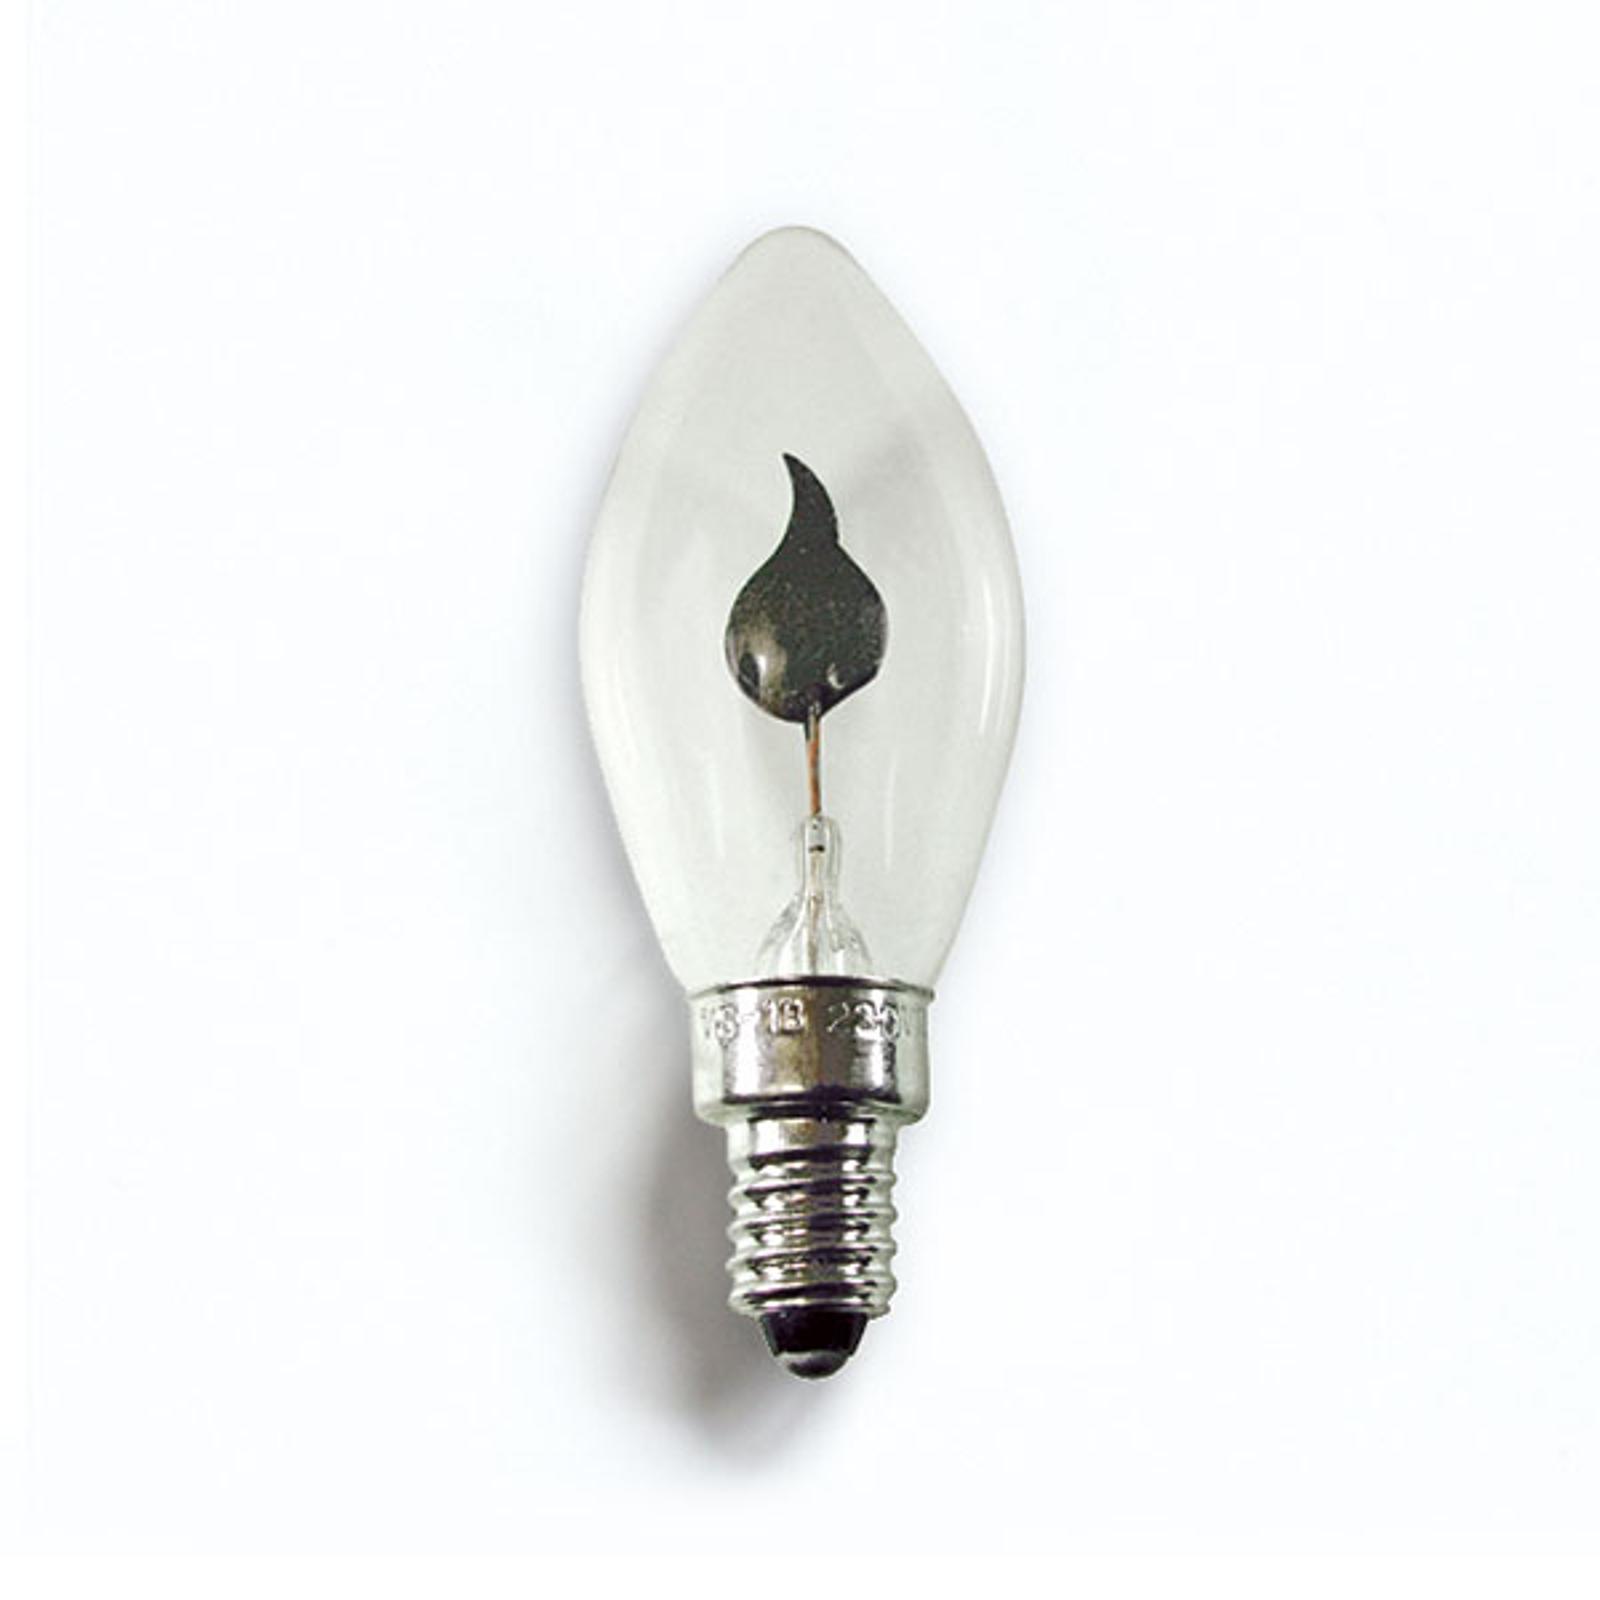 E10 1,5W 230V reservlampor 2-pack fladdrande ljus